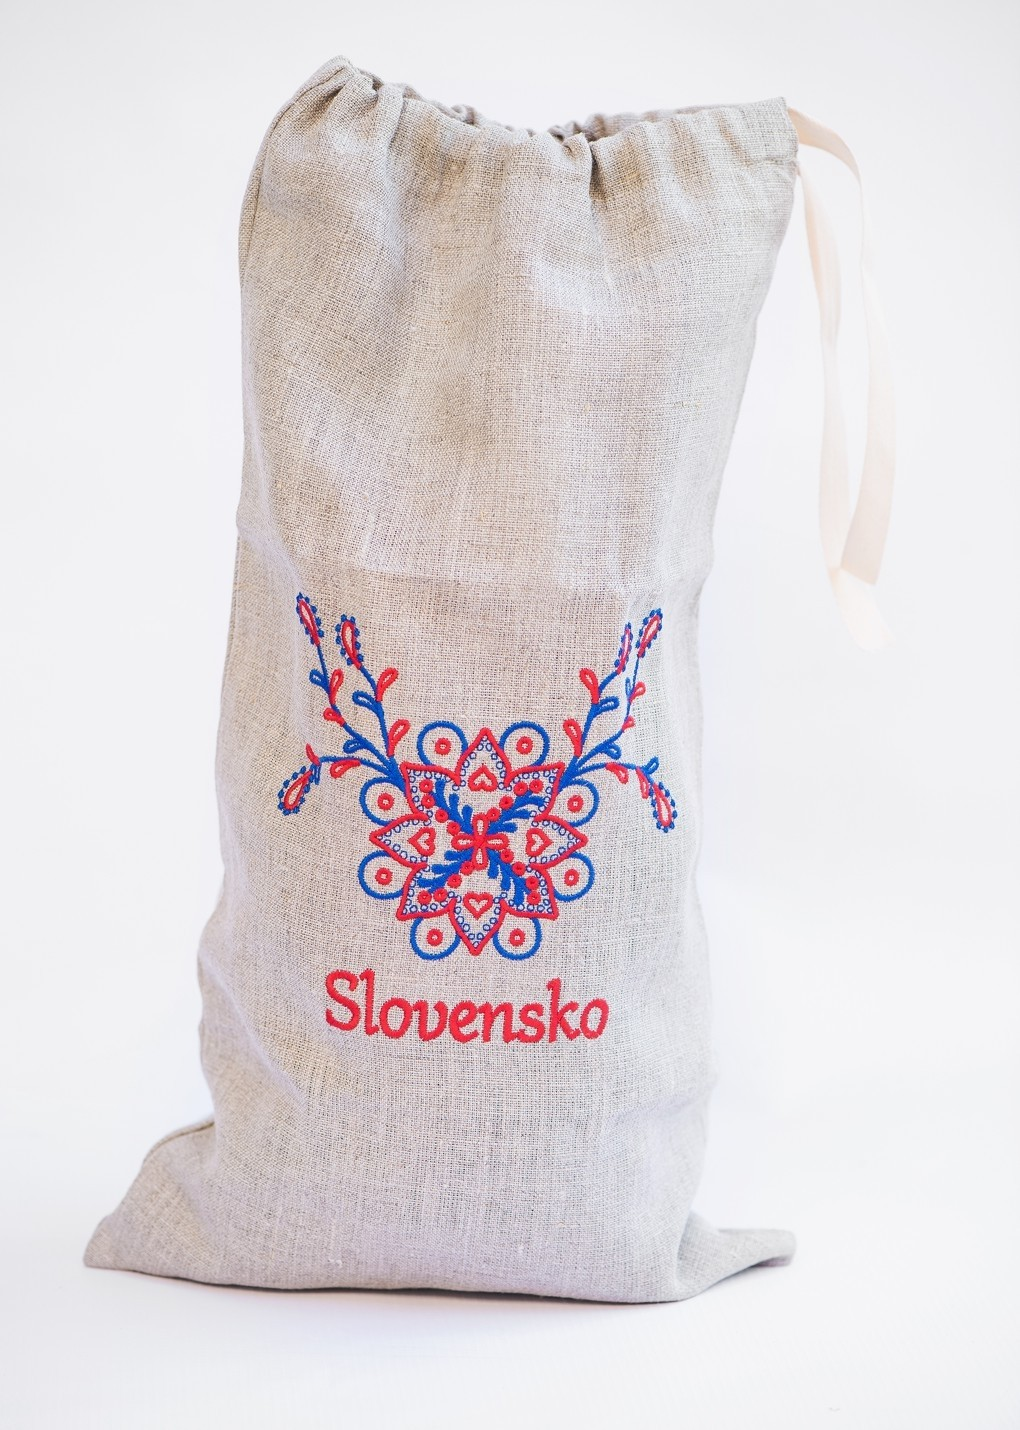 Vrecko na chlieb s motívom Slovensko